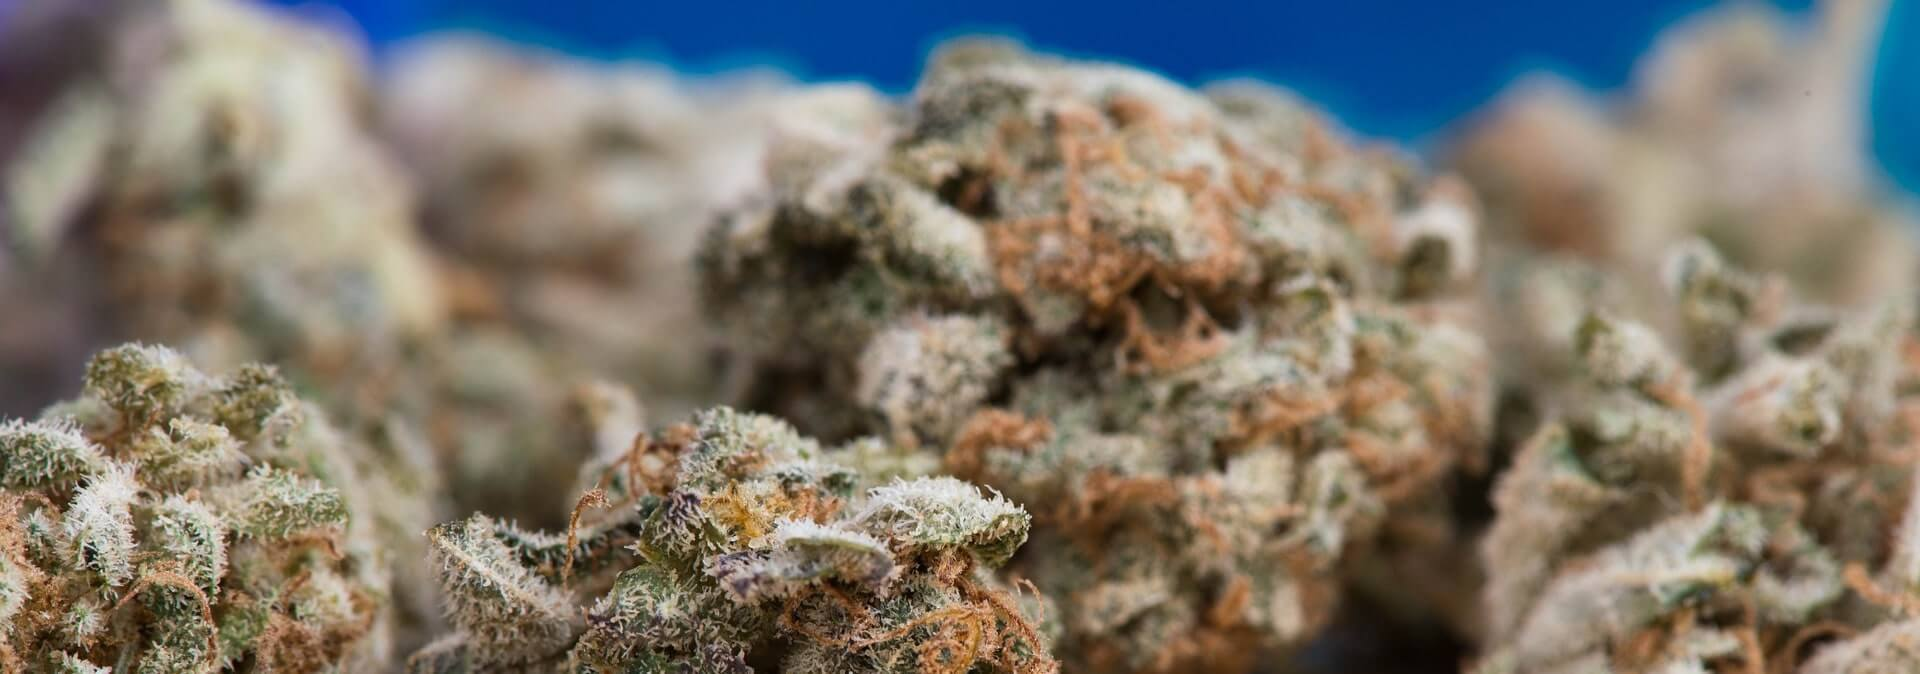 cannabis on a blue background